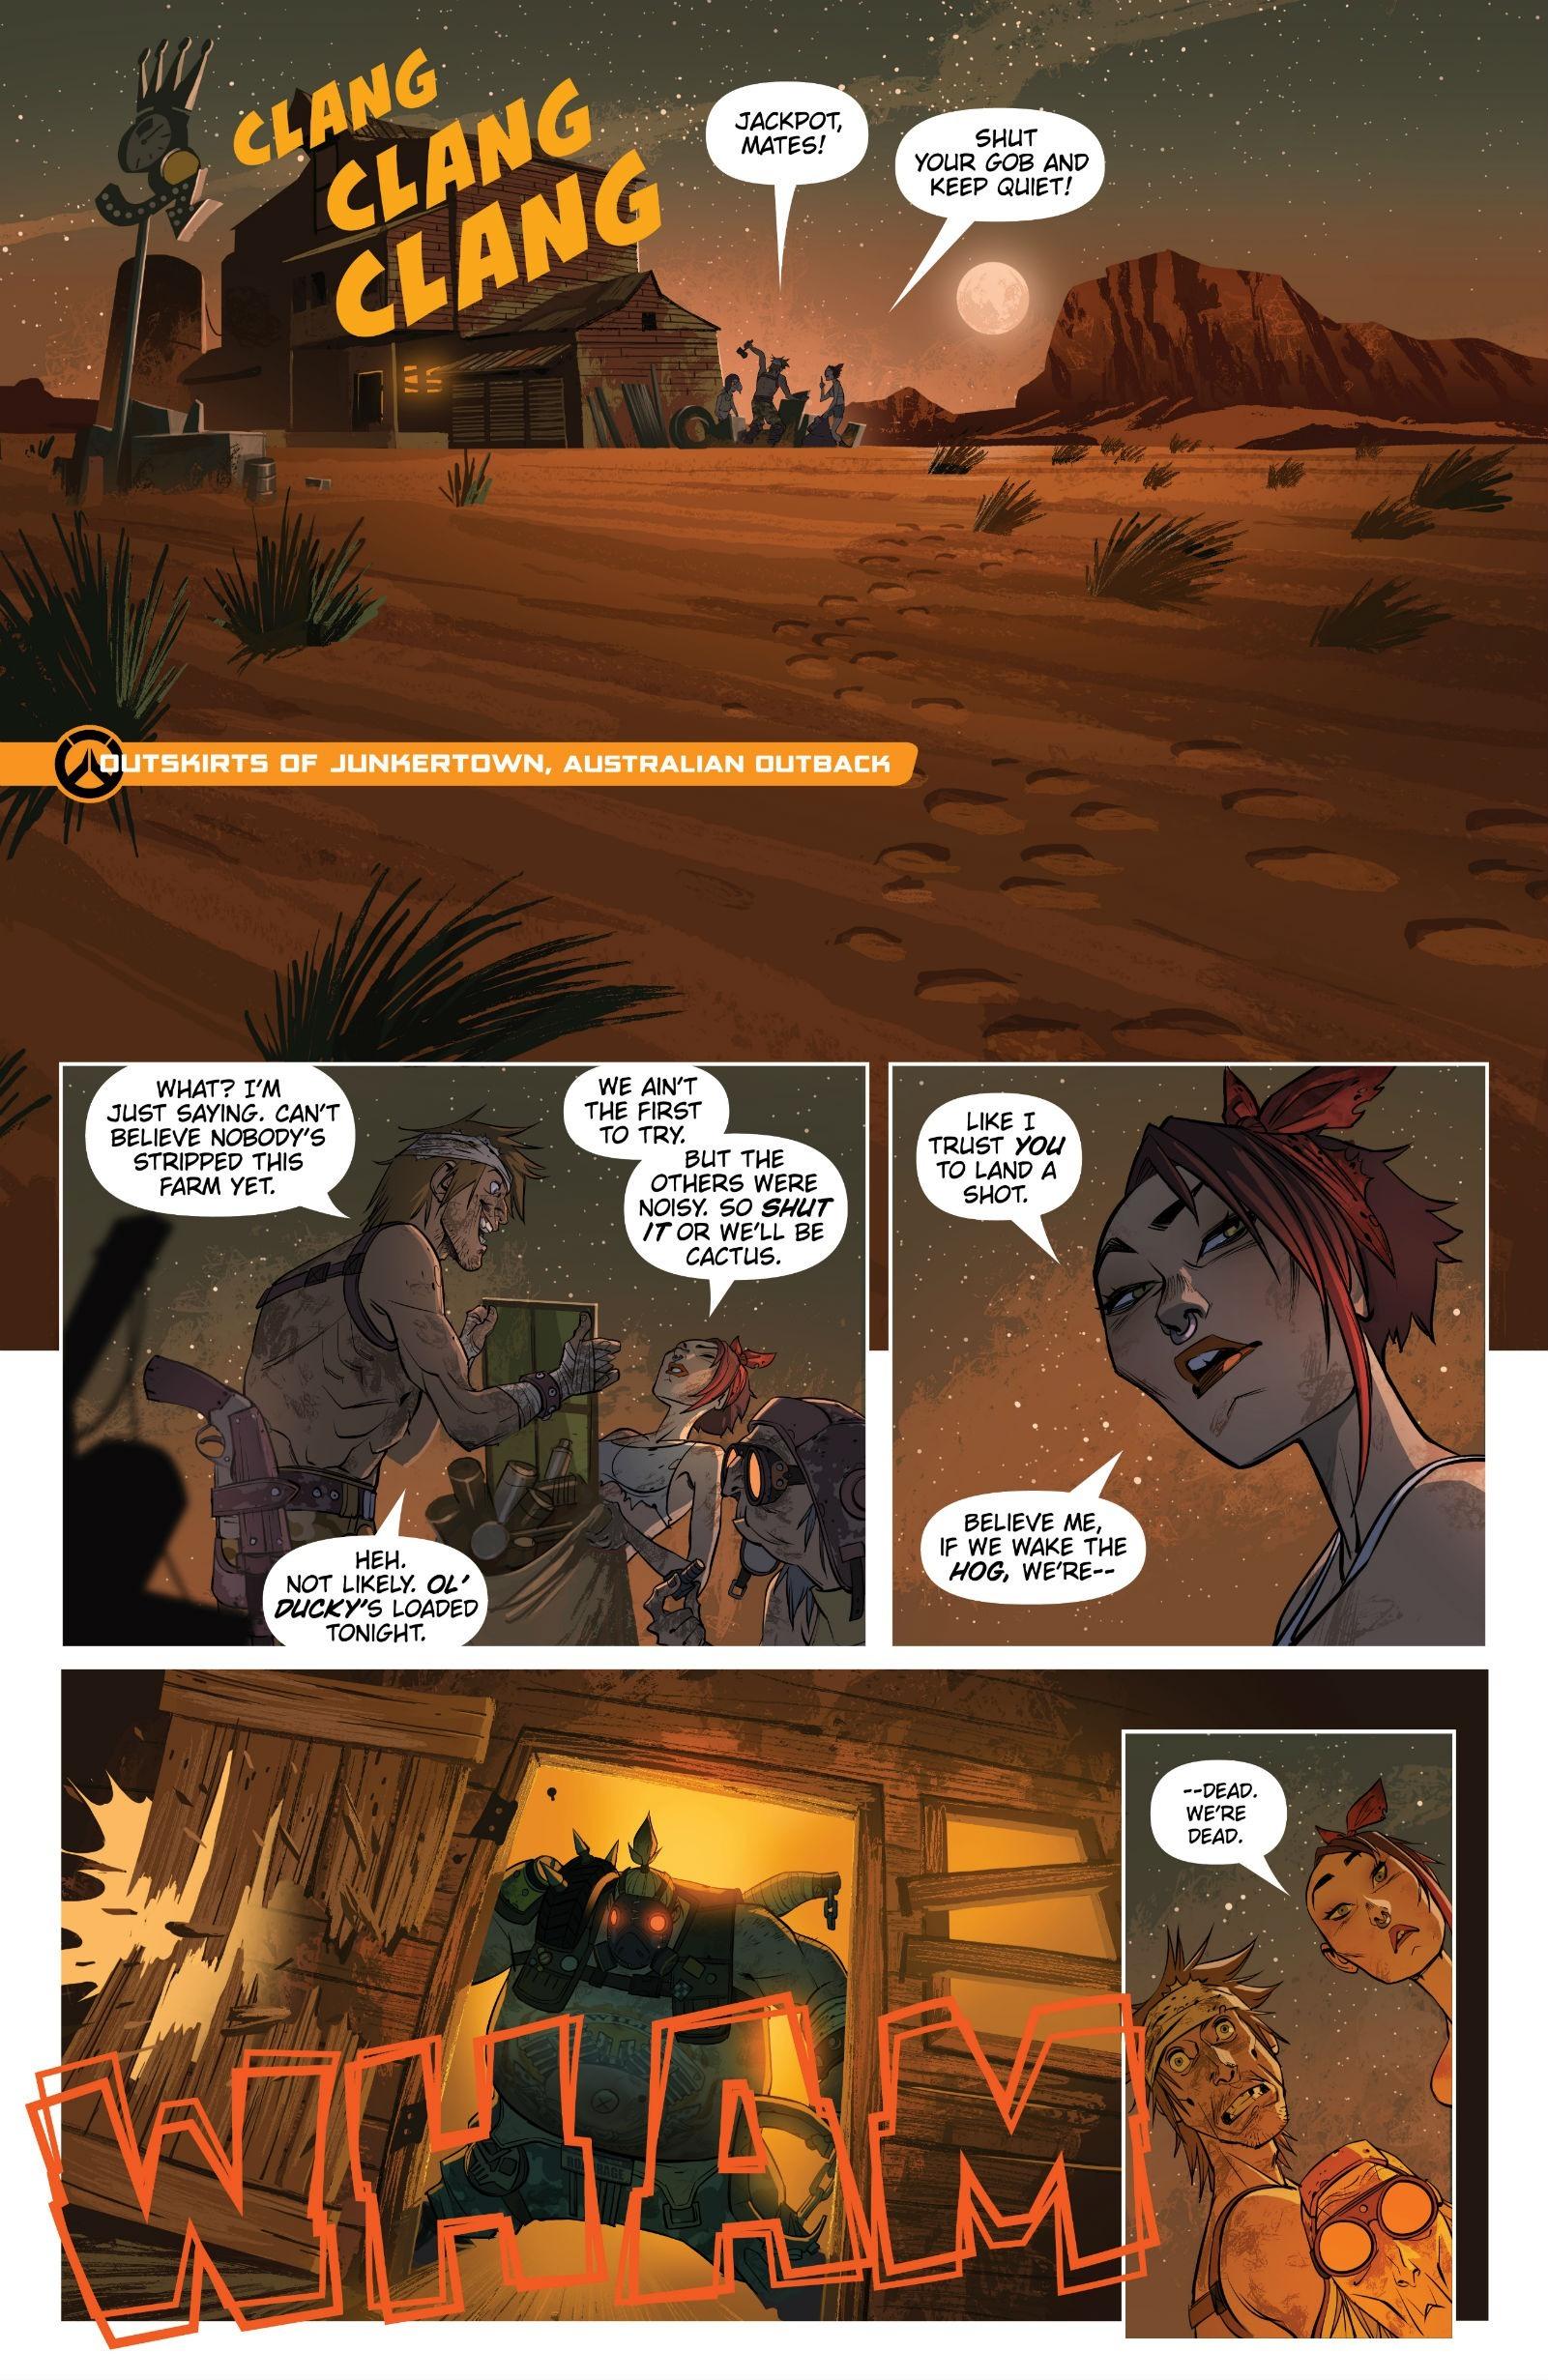 roadhog-sera-siguiente-protagonista1-comic-overwatch-frikigamers.com